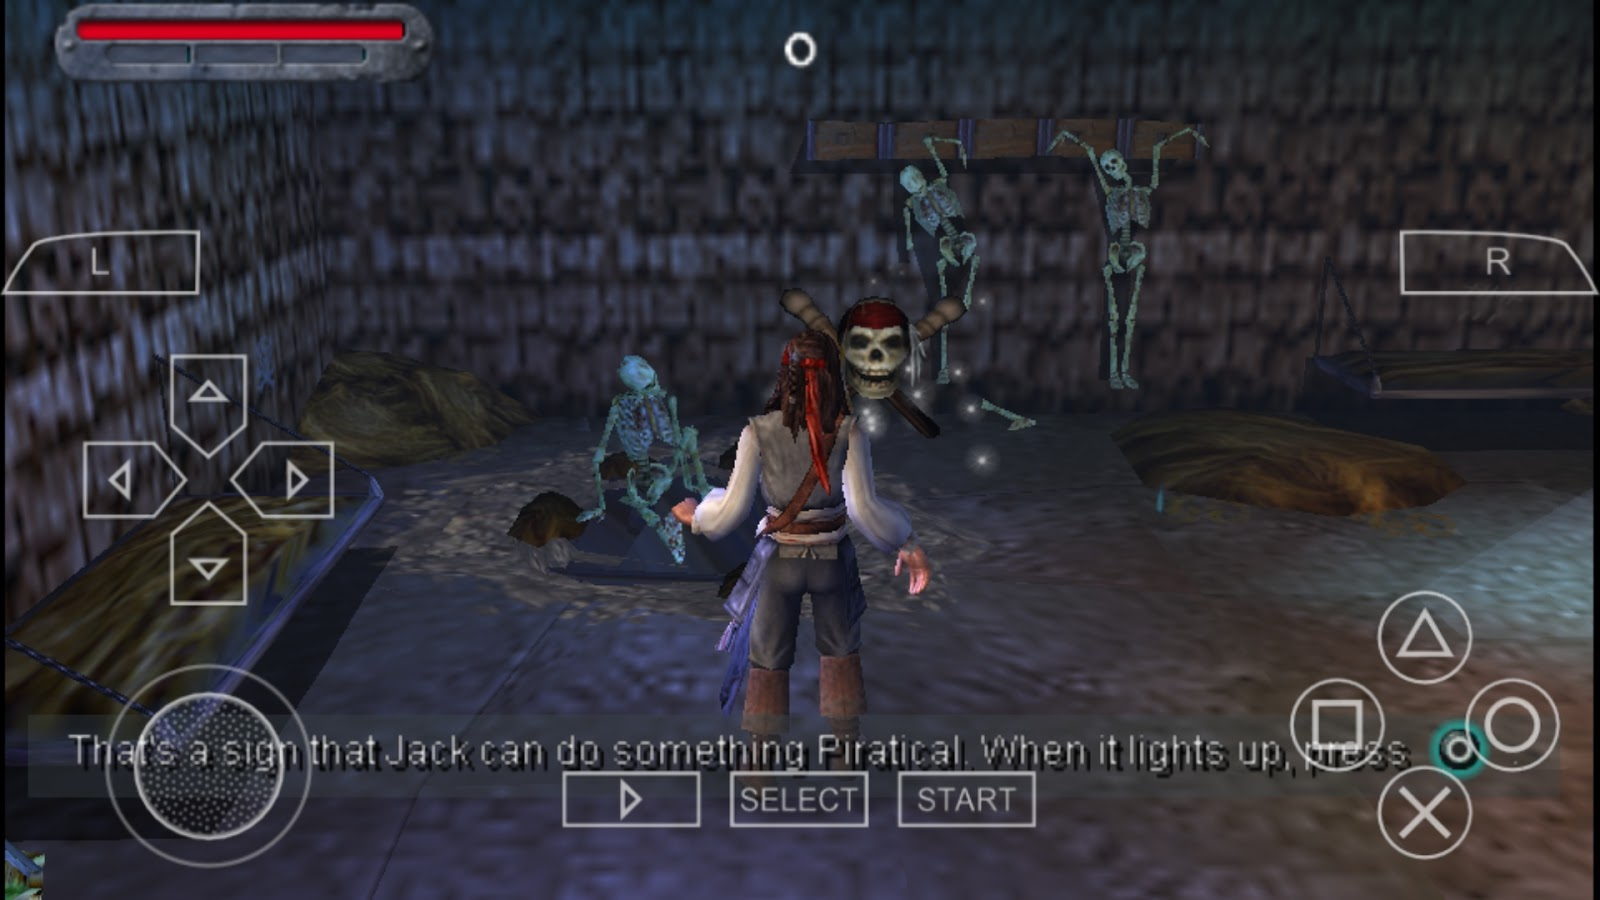 Games list #1 - Download PlayStation Portable/ppsspp emulator (ISOs